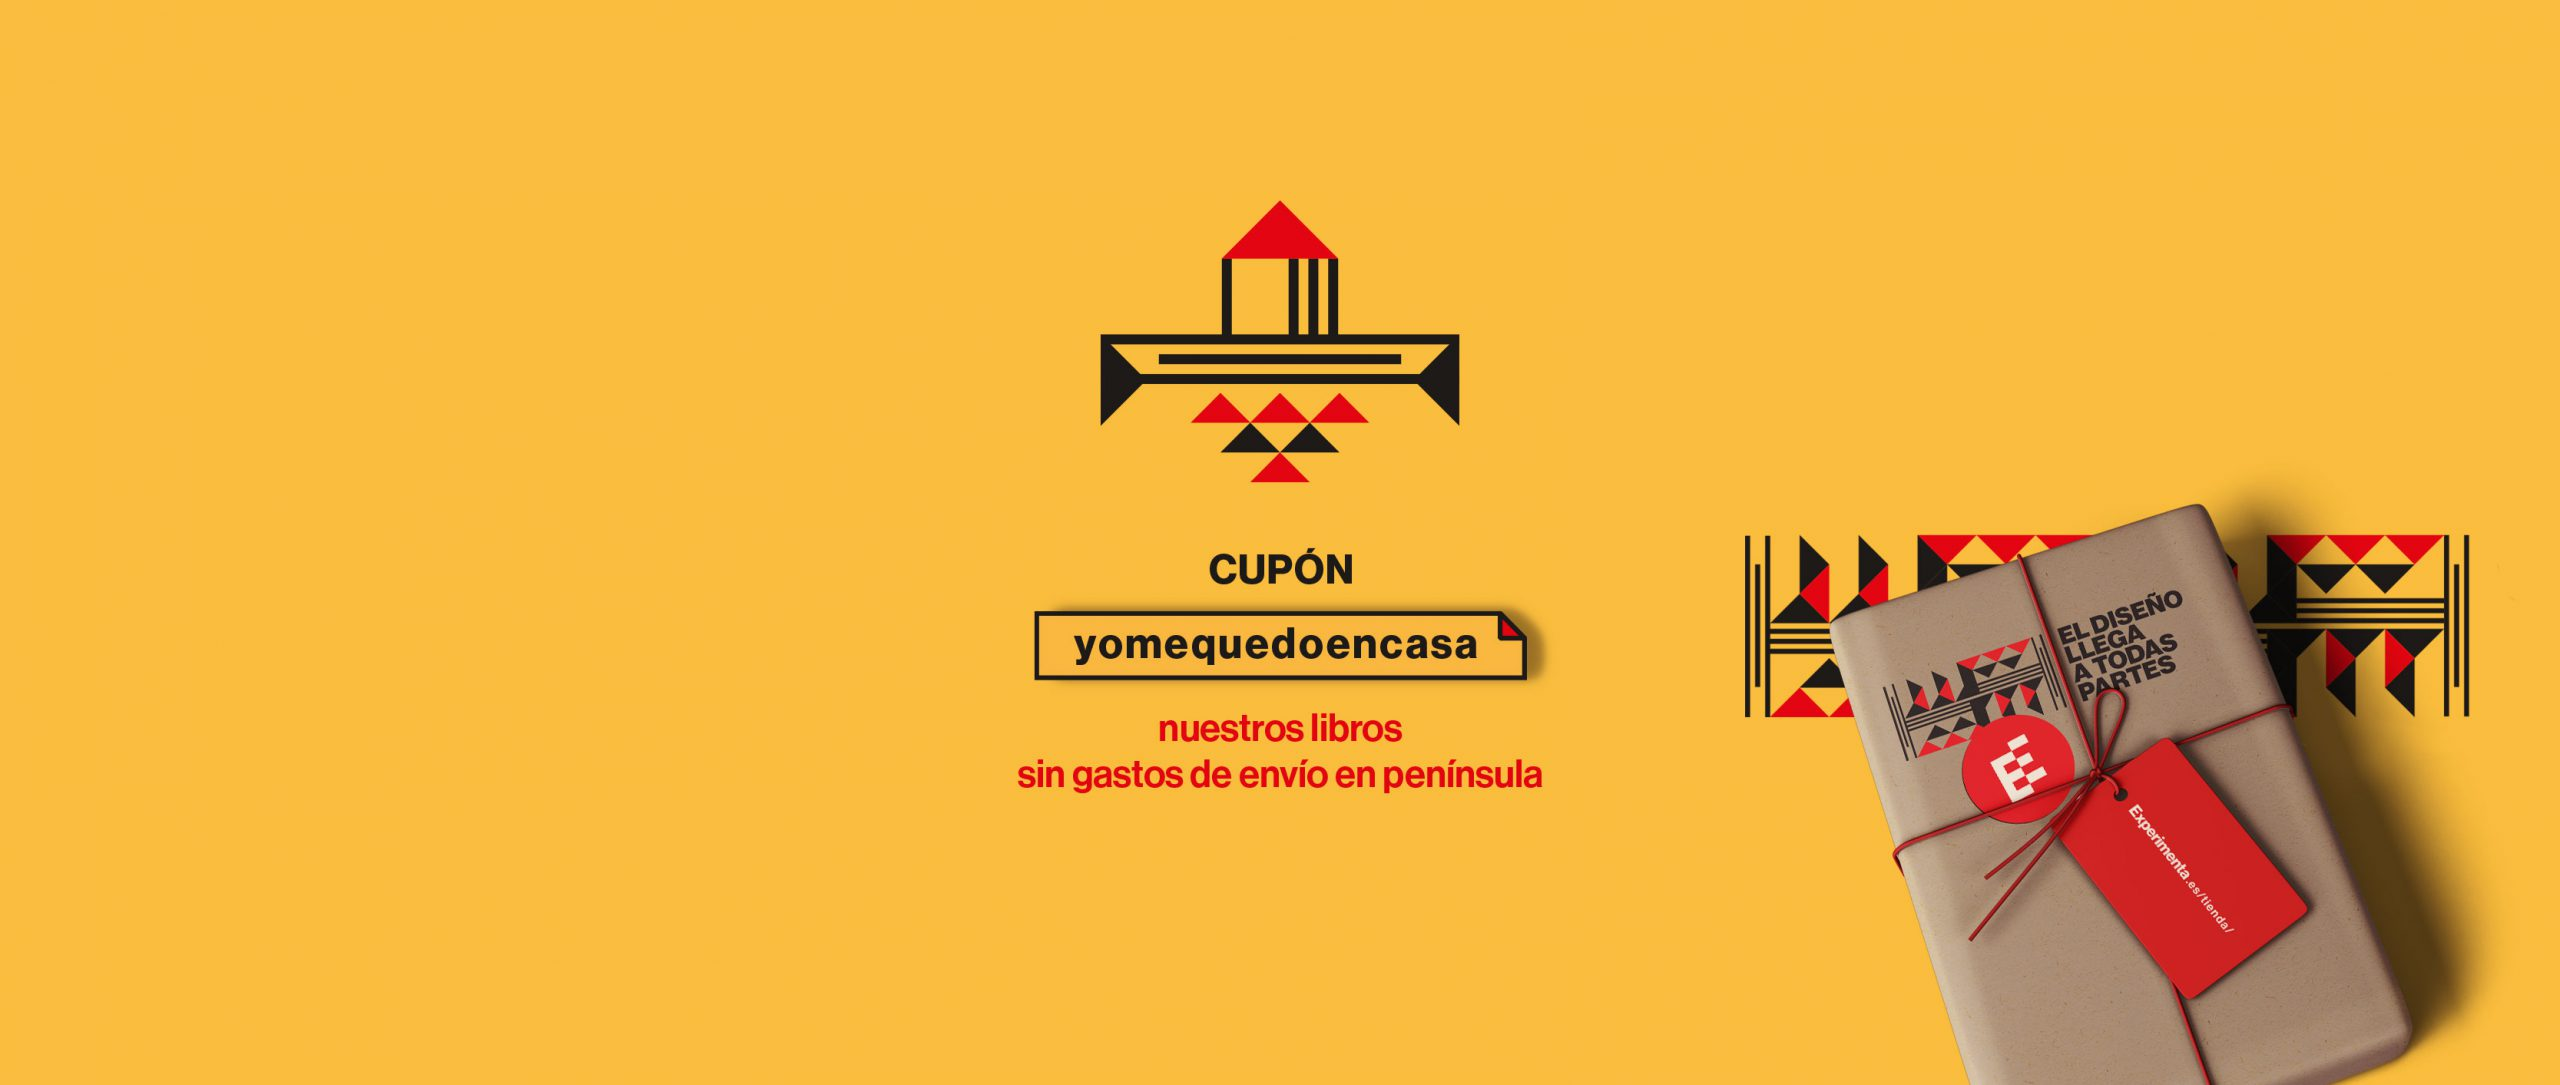 SLIDER-PRINCIPAL-YMQECPROM